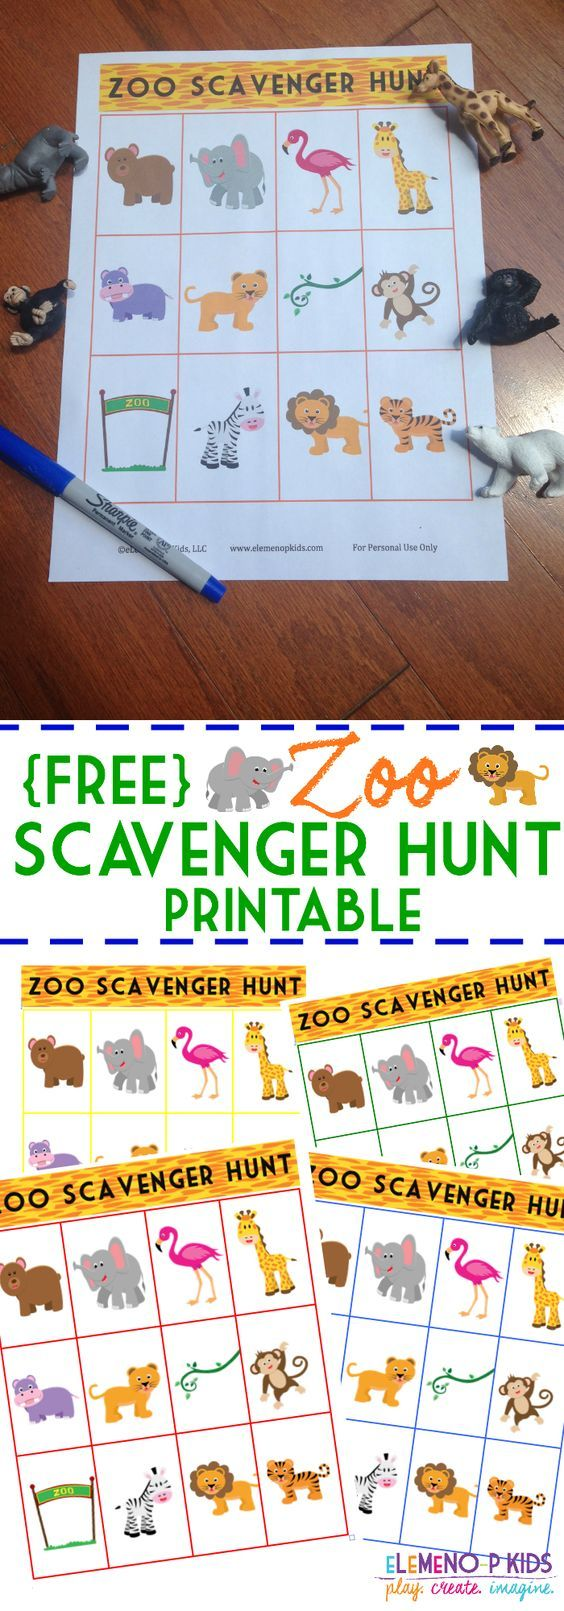 Zoo Scavenger Hunt Printable eLeMeNOP Kids Zoo